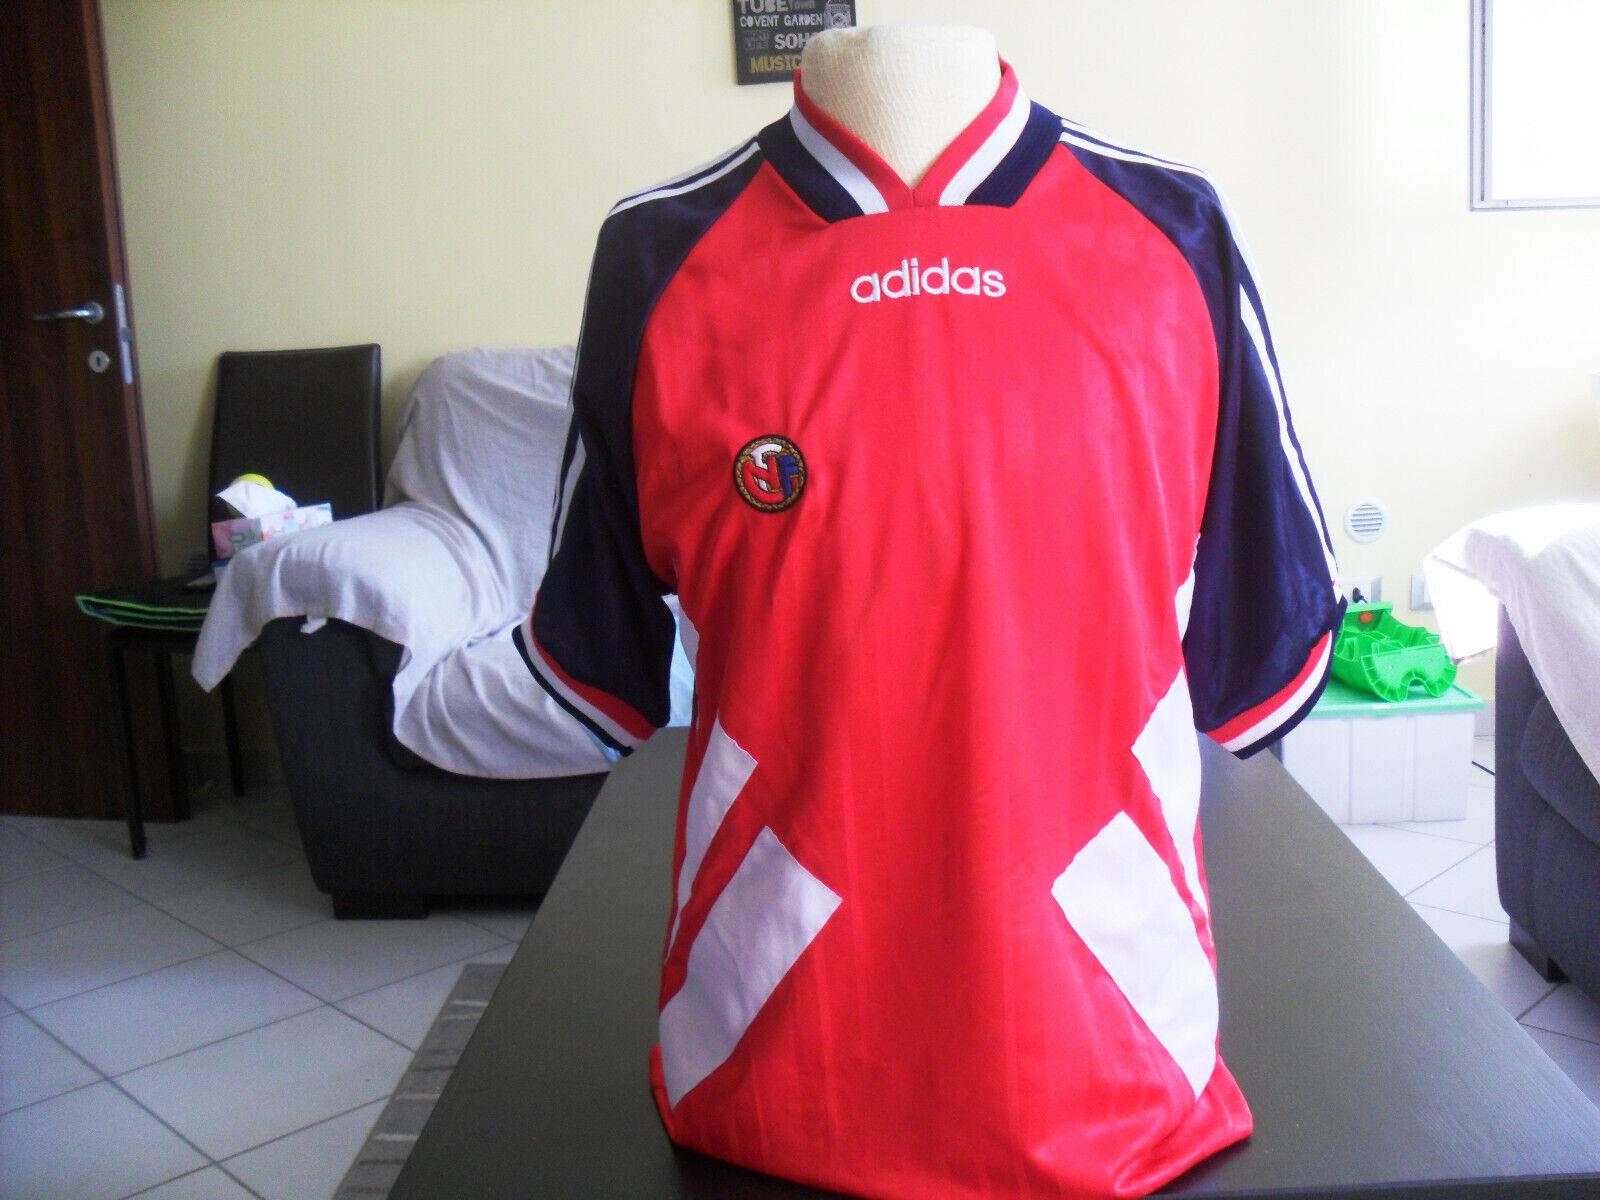 Maglia shirt Norvegia Norway 1994 world cup usa 94 original adidas Diuominiione M